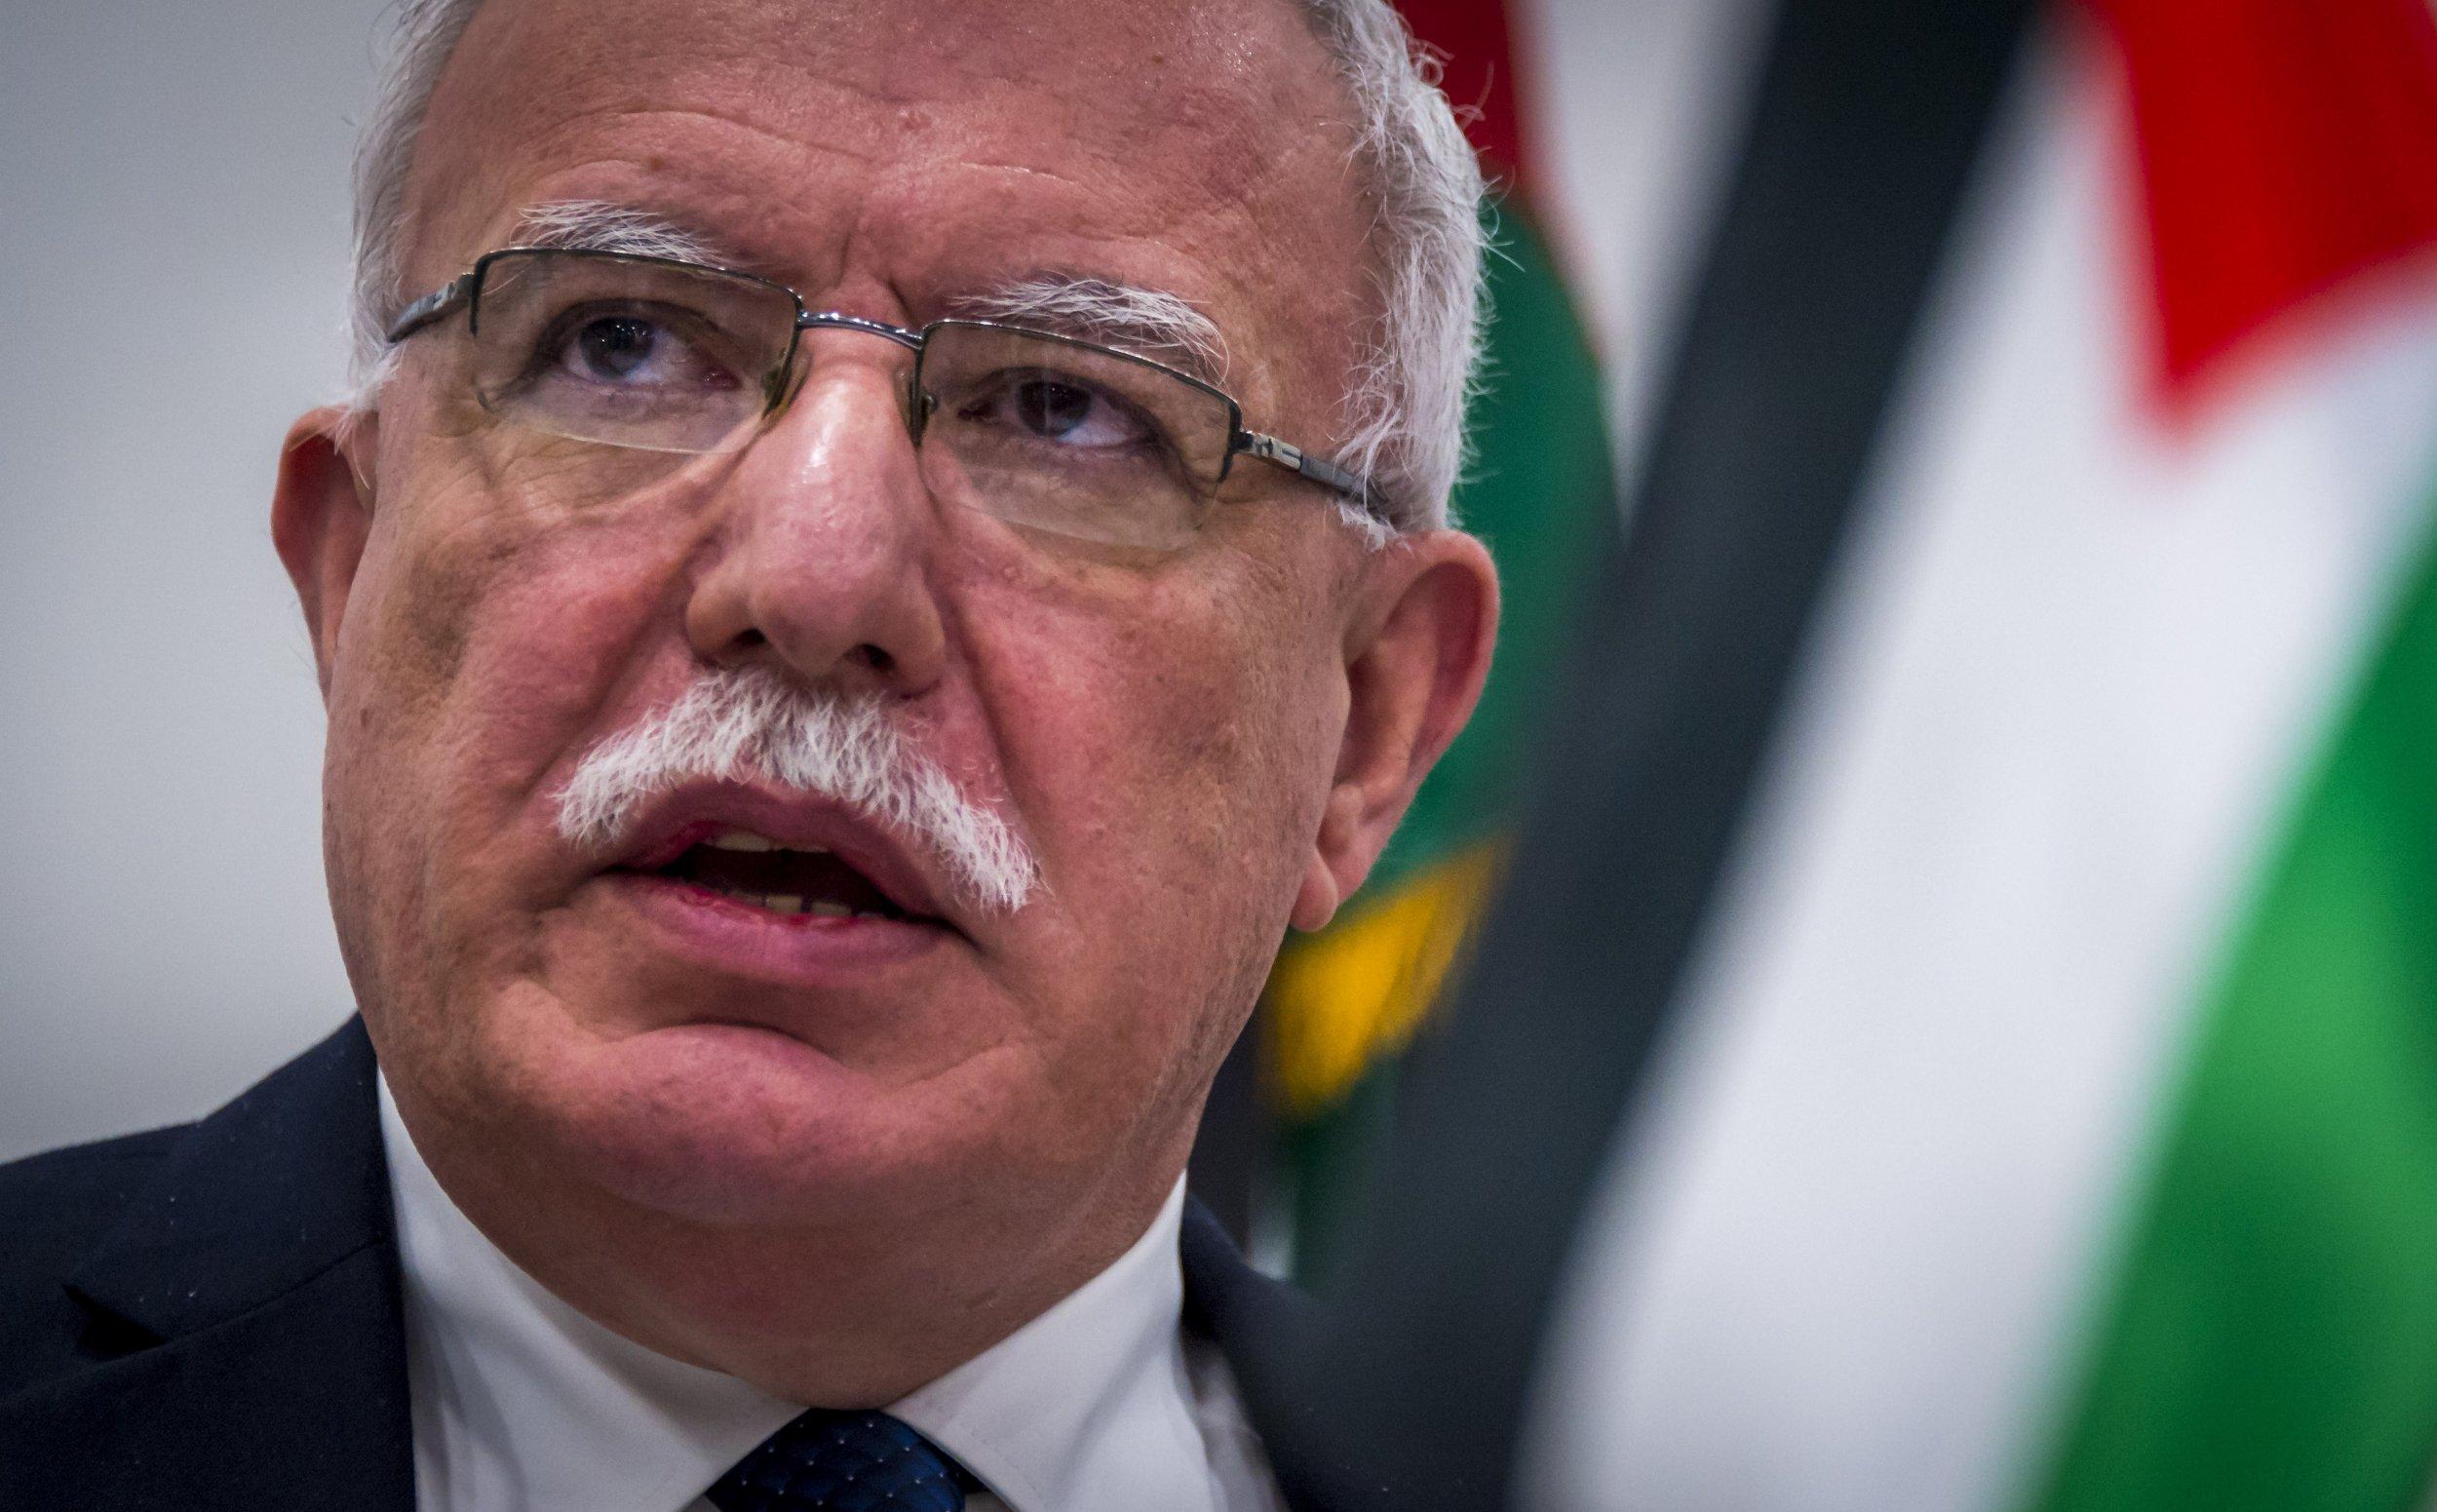 Palestine's al-Maliki: US peace plan a 'surrender act'